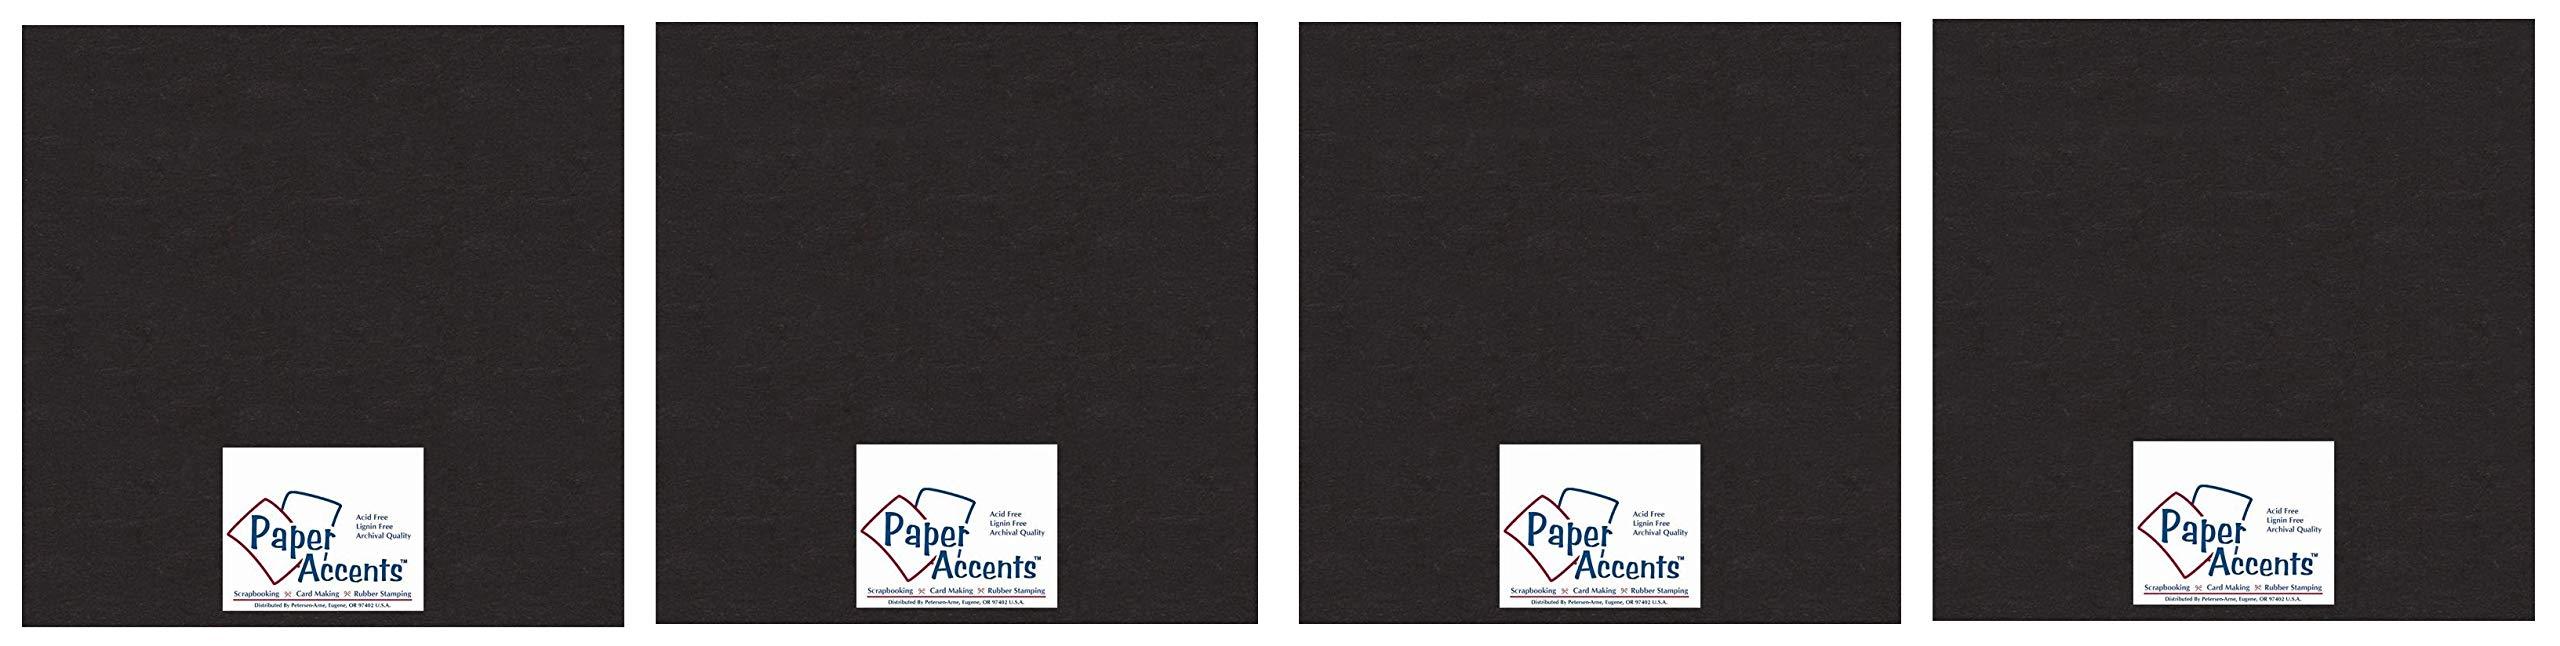 Accent Design Paper Accents Chpbrd Chipboard 12x12 1X Heavy 50pt Black, 25 Piece (Fоur Paсk)